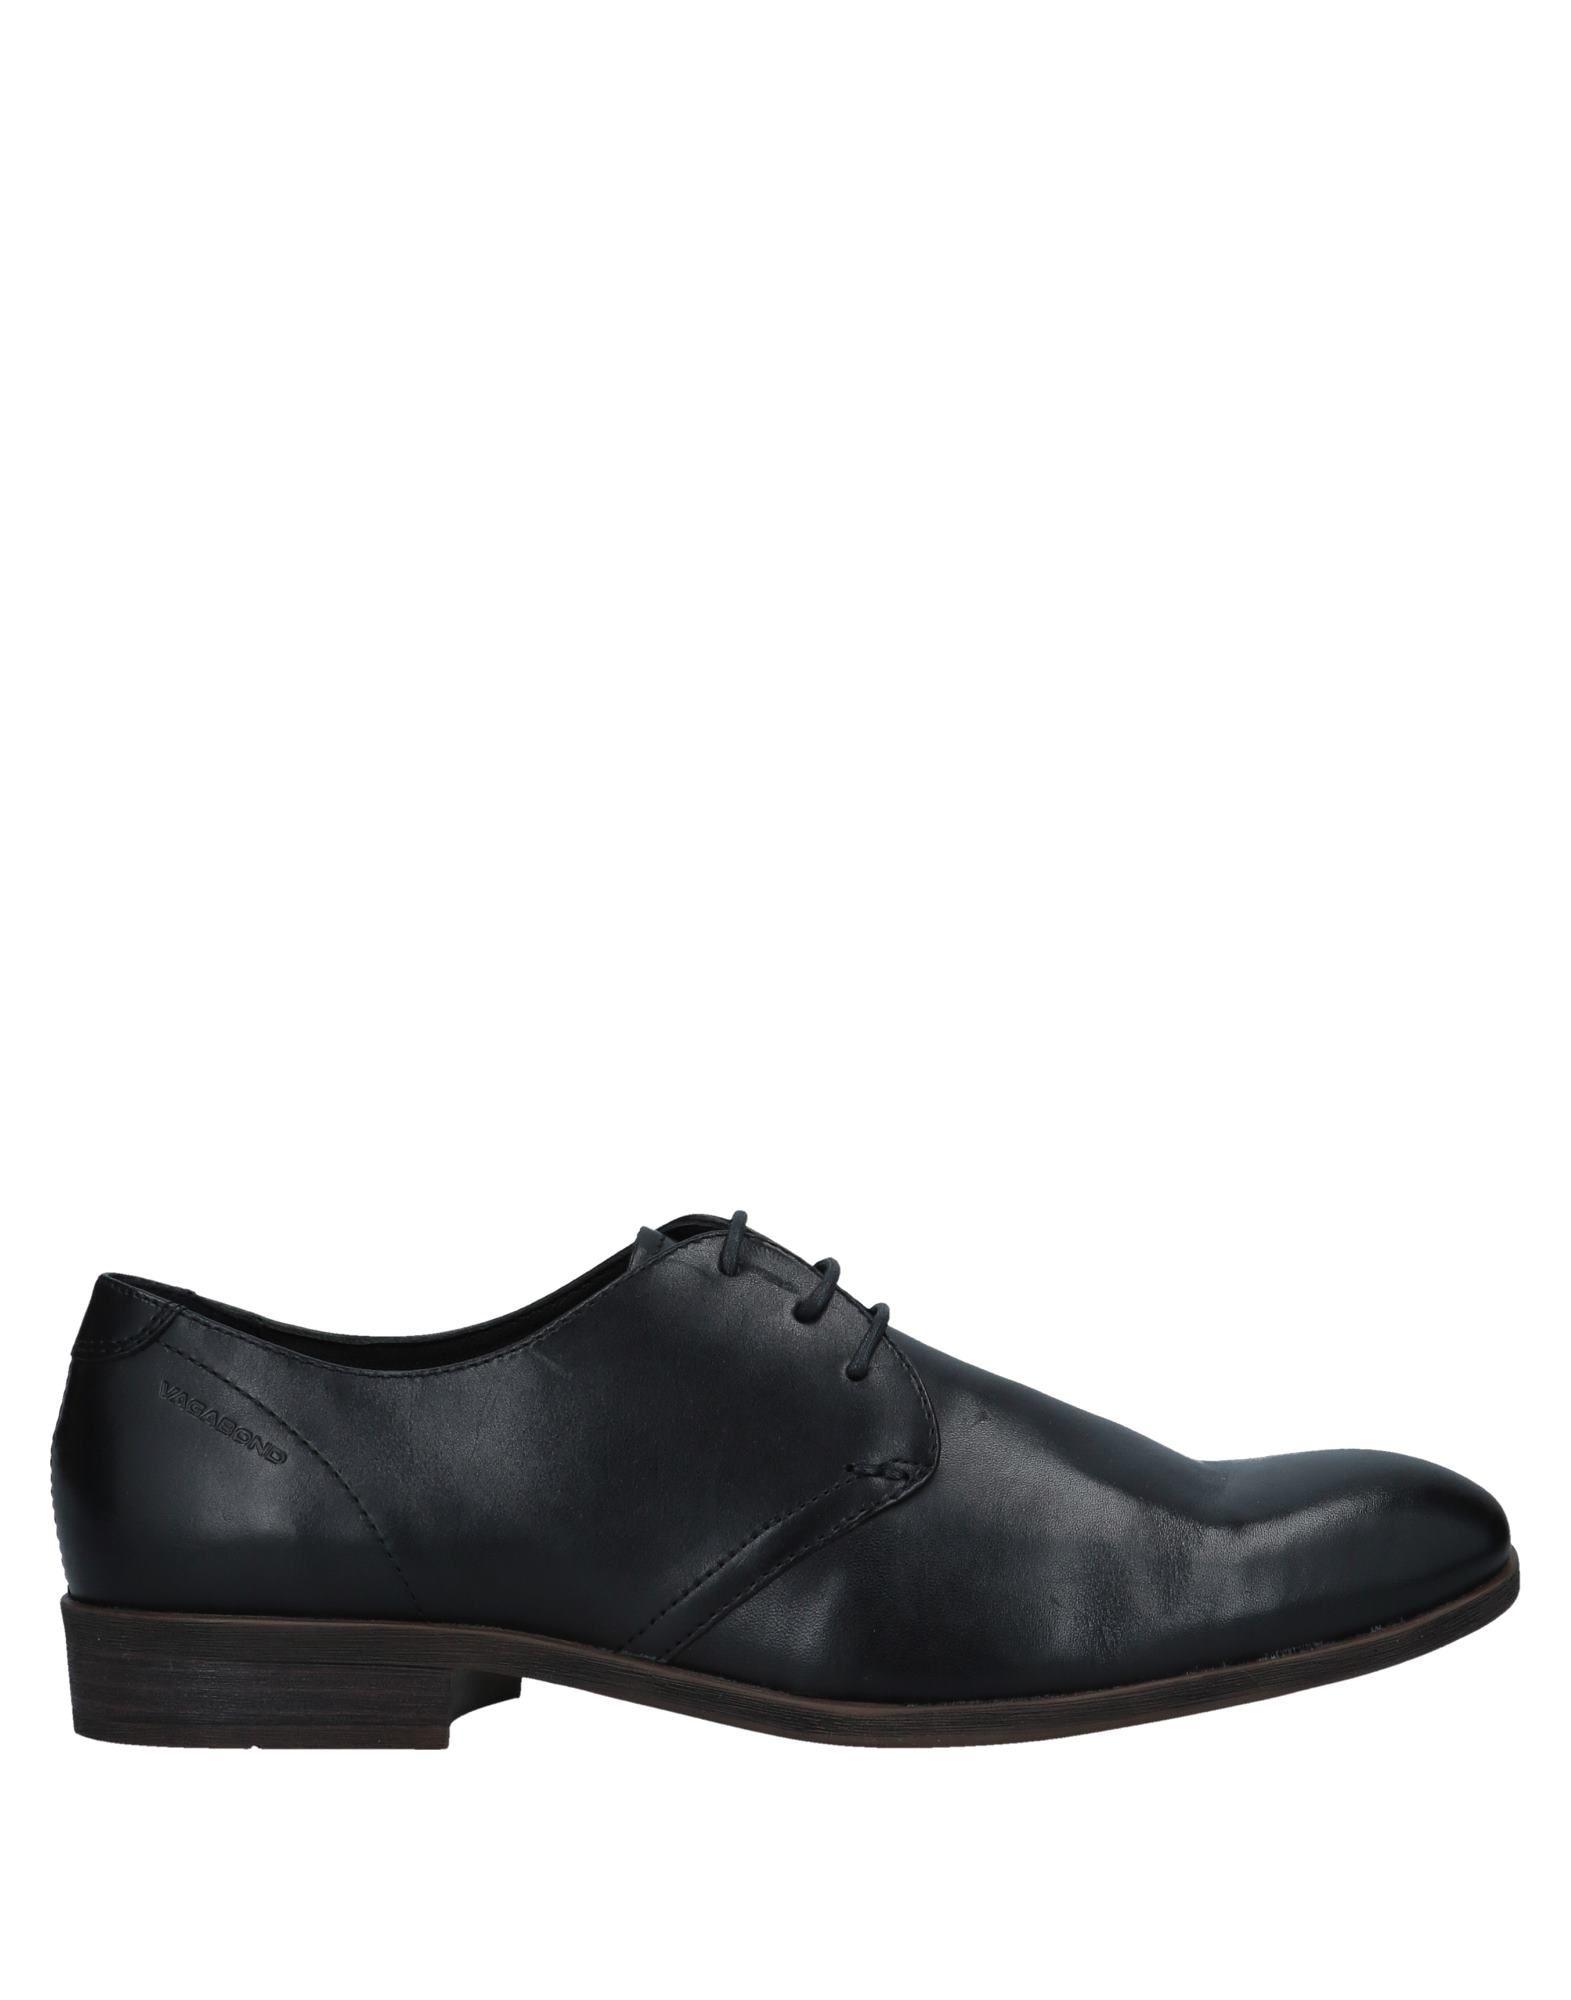 Stringate Vagabond Shoemakers Uomo - 11554522LM